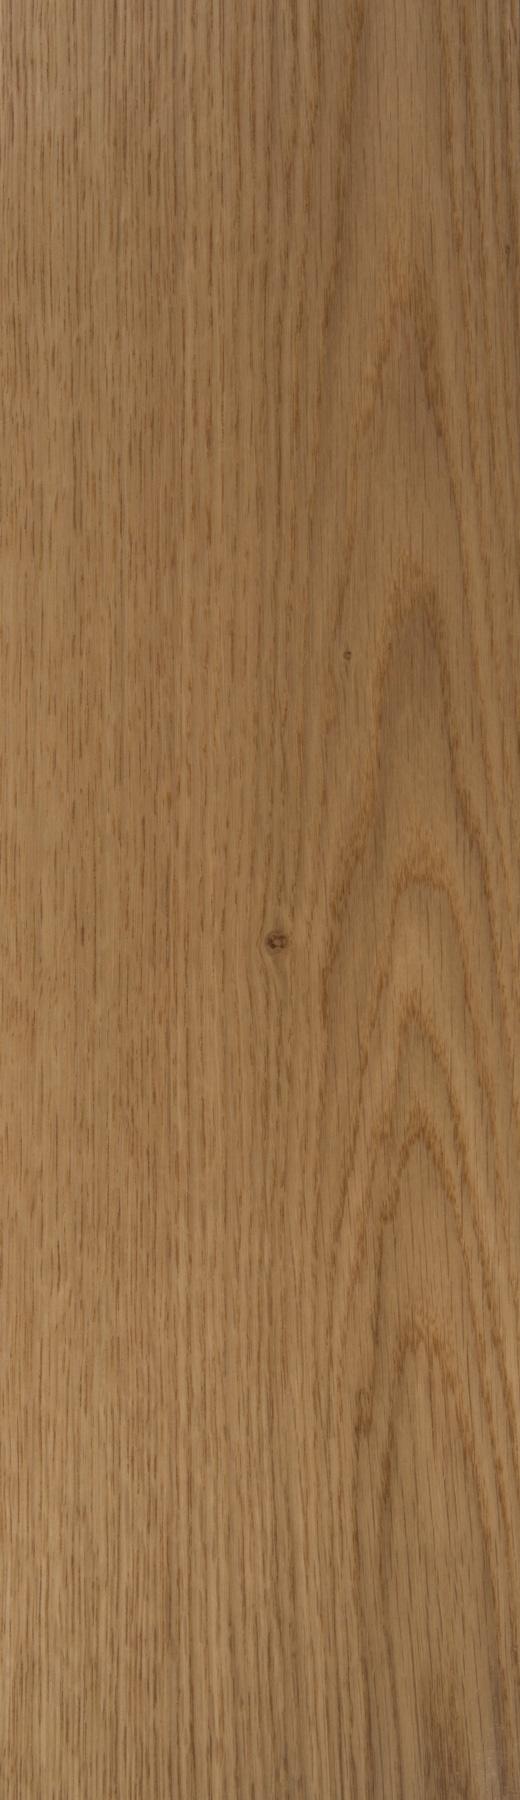 maderas-terramont-loft-life-white-oak